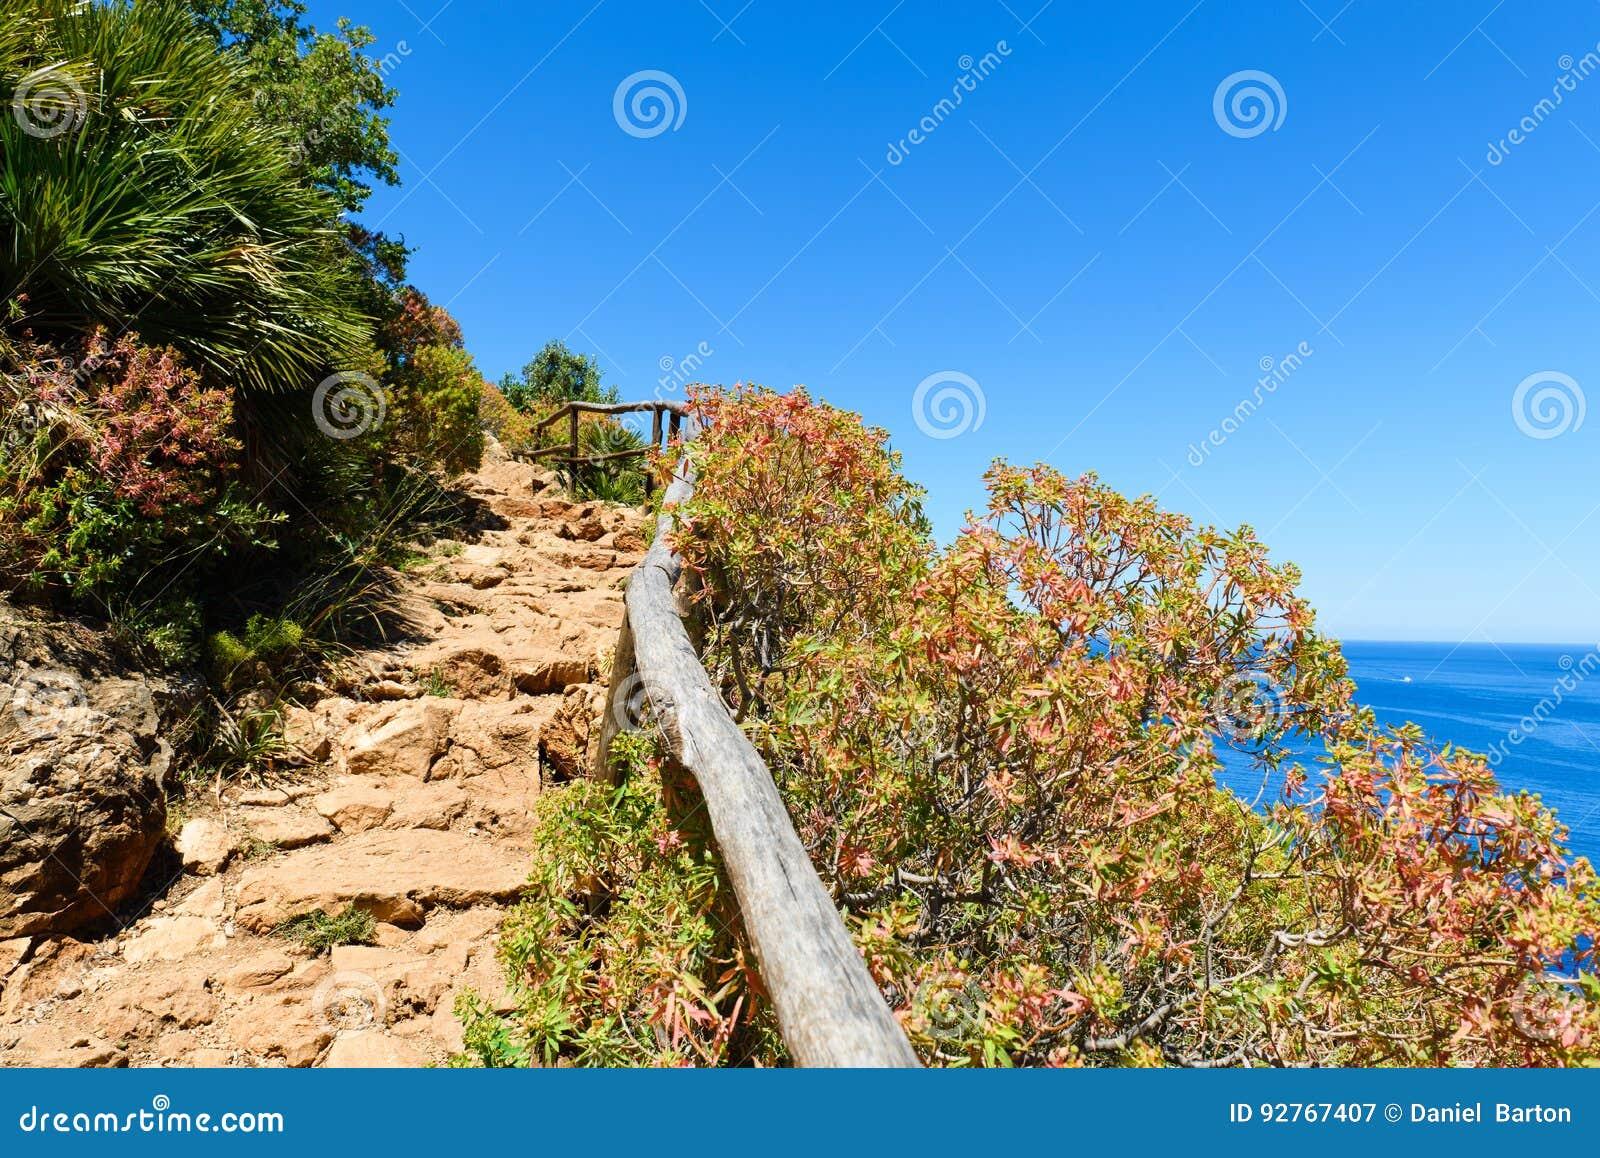 A coastal path